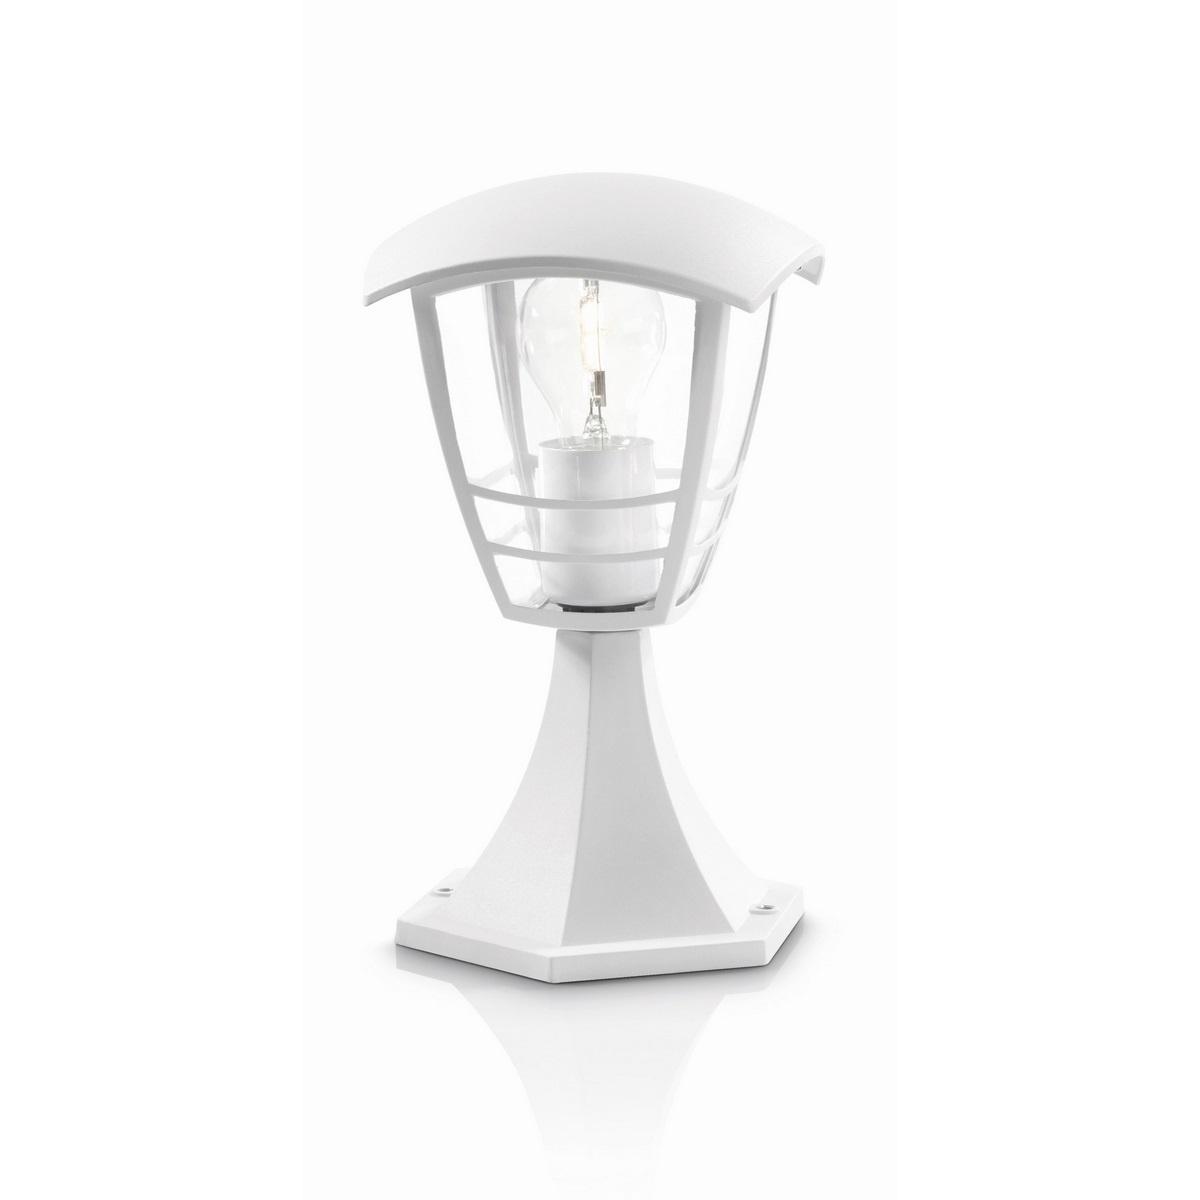 Philips 15382/31/16 Creek Vonkajšie stĺpikové svietidlo 30 cm, biela